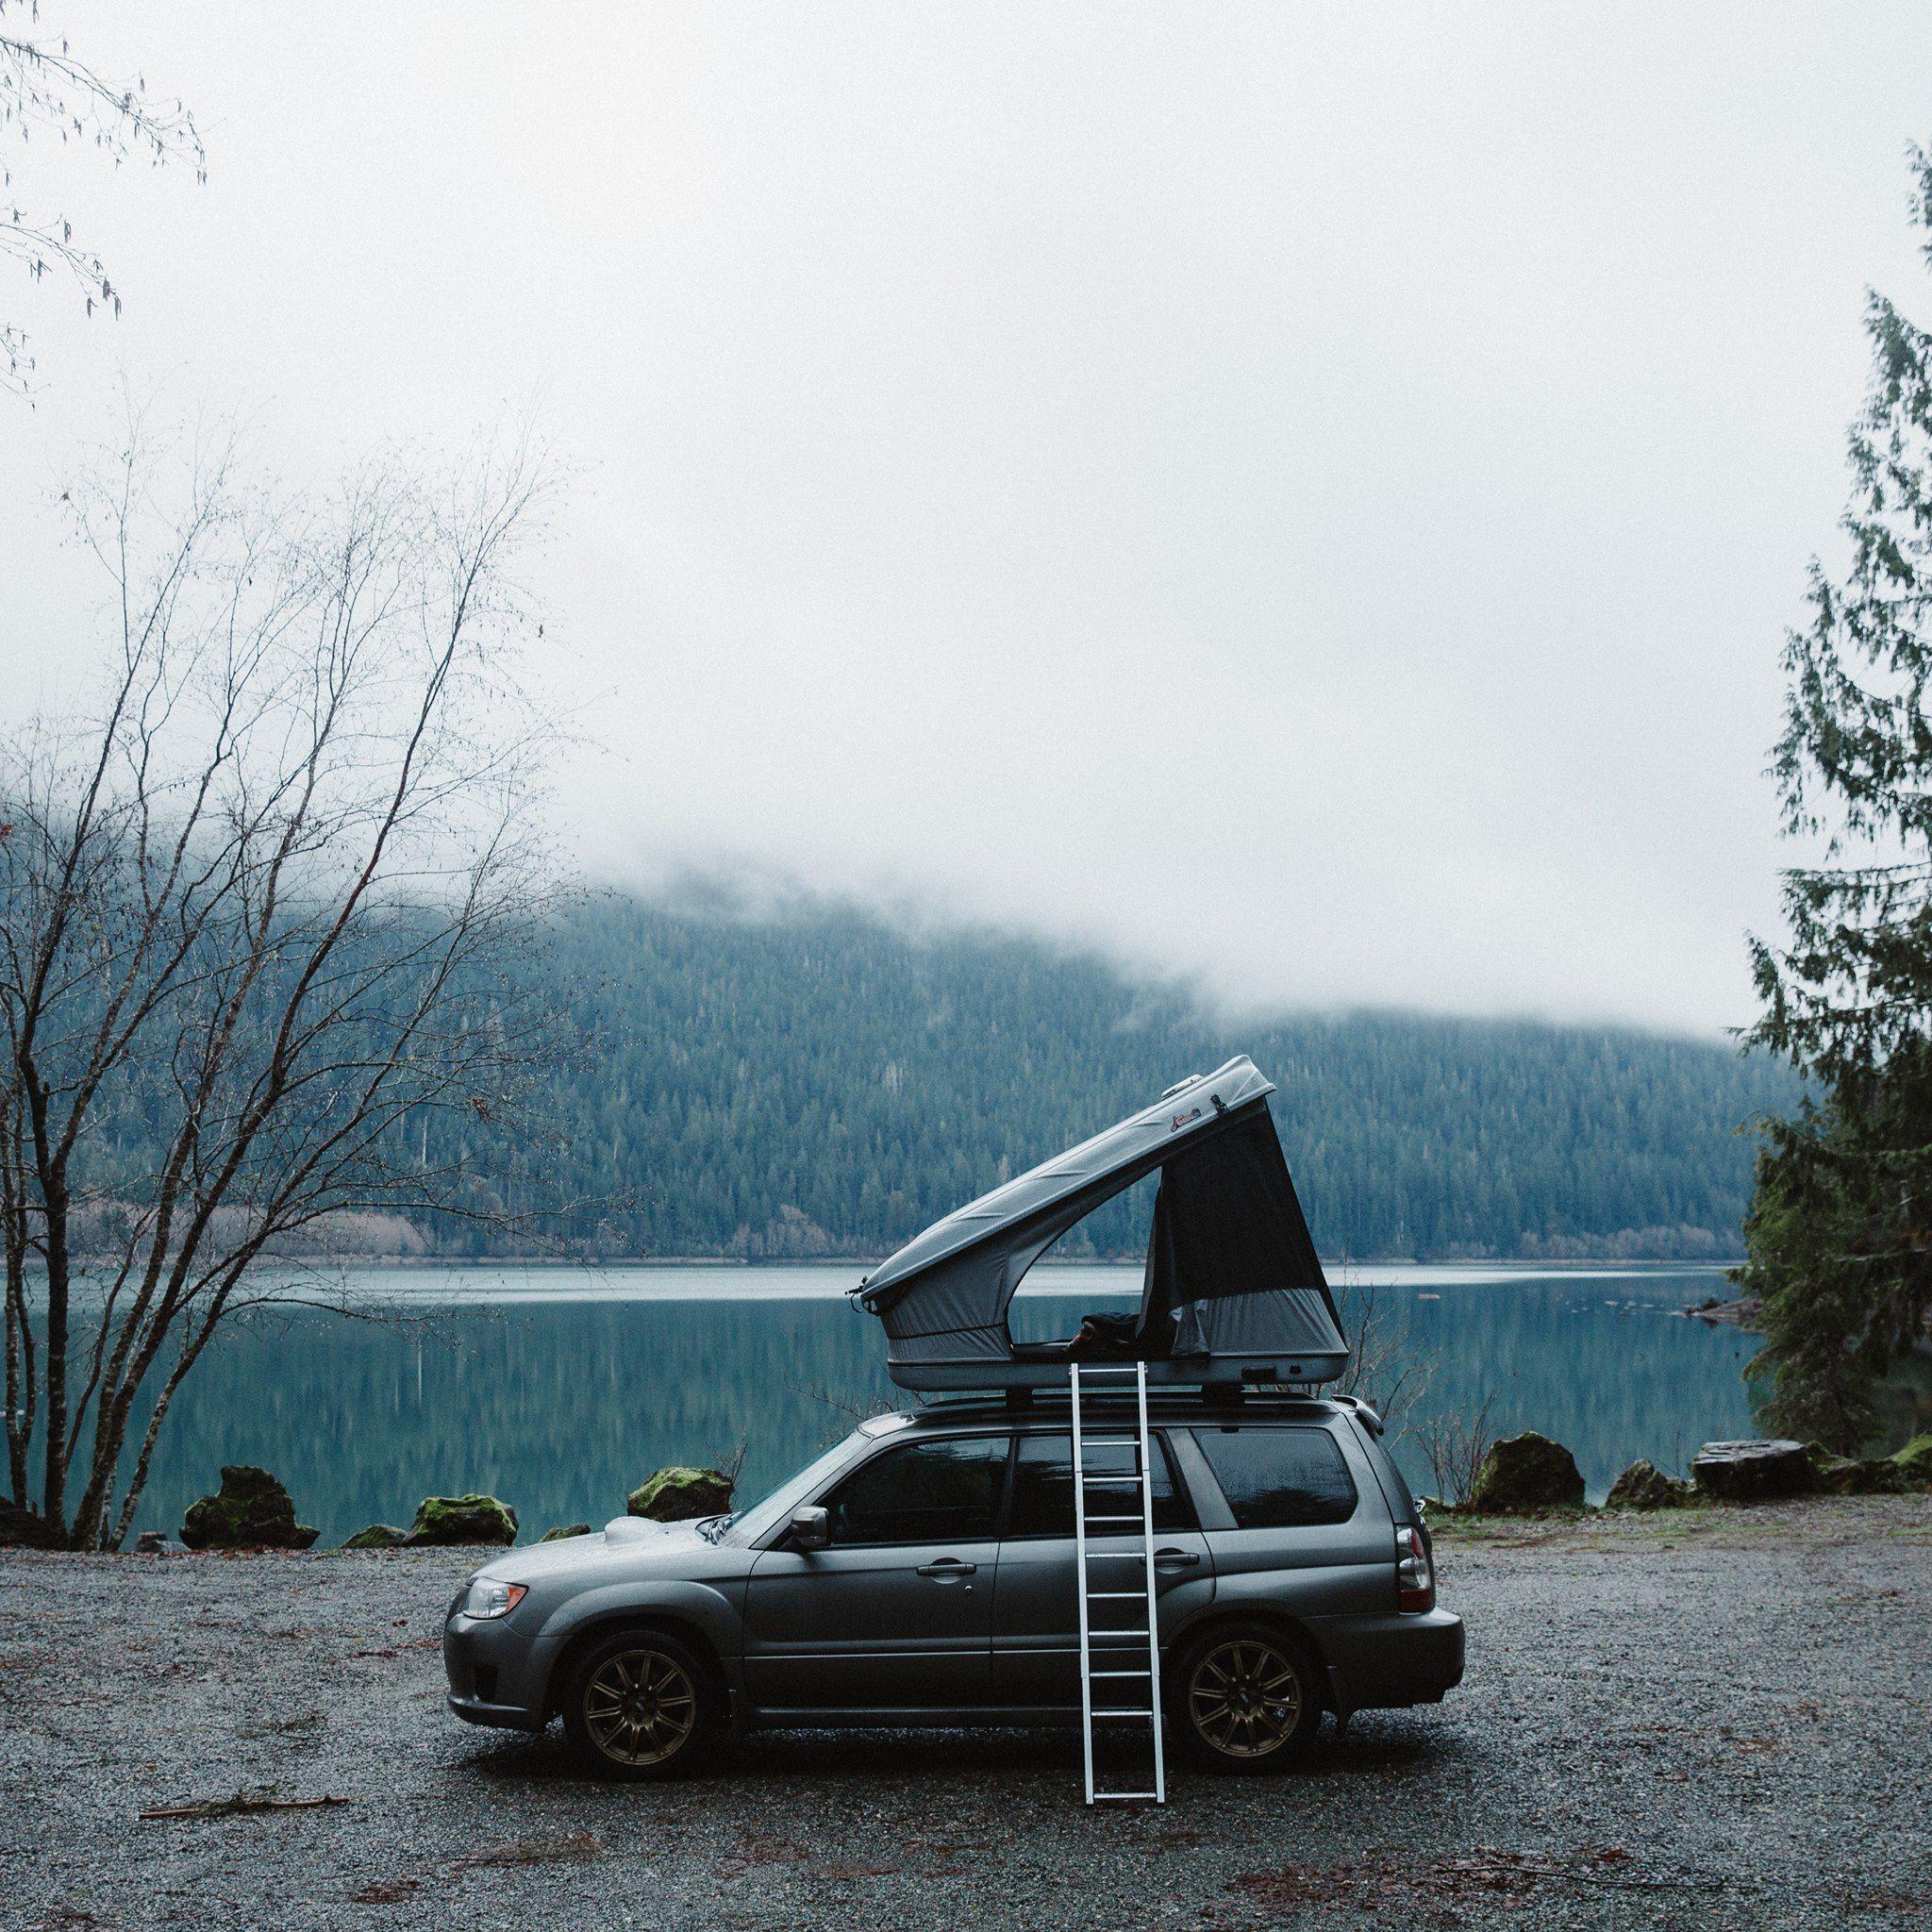 Subaru Forester Xt James Baroud Rooftop Tent Family